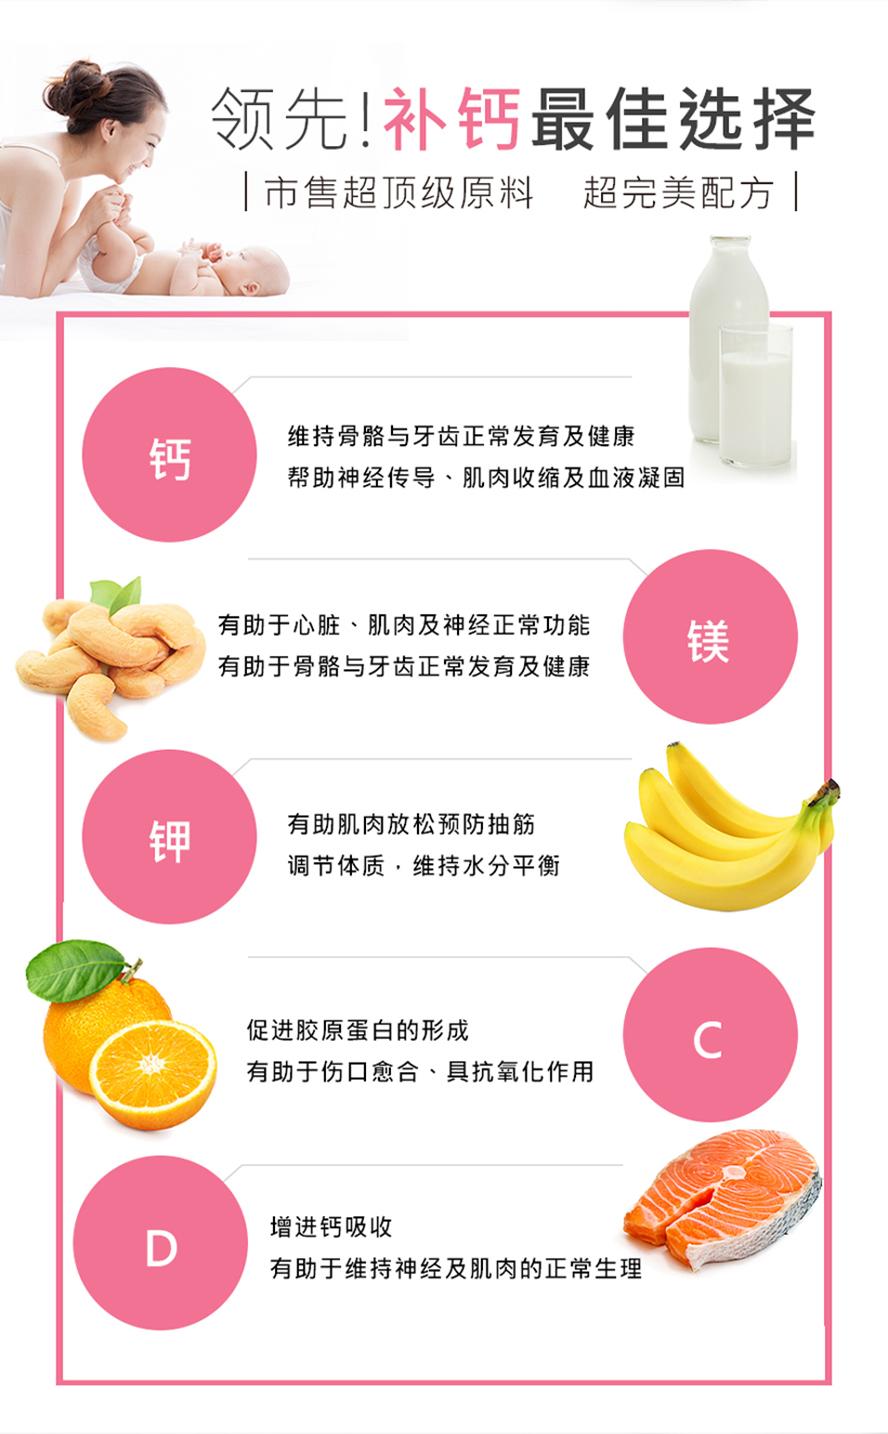 BHK's孕妈咪螯合钙+D完胜市售品牌,挑战最高吸收率